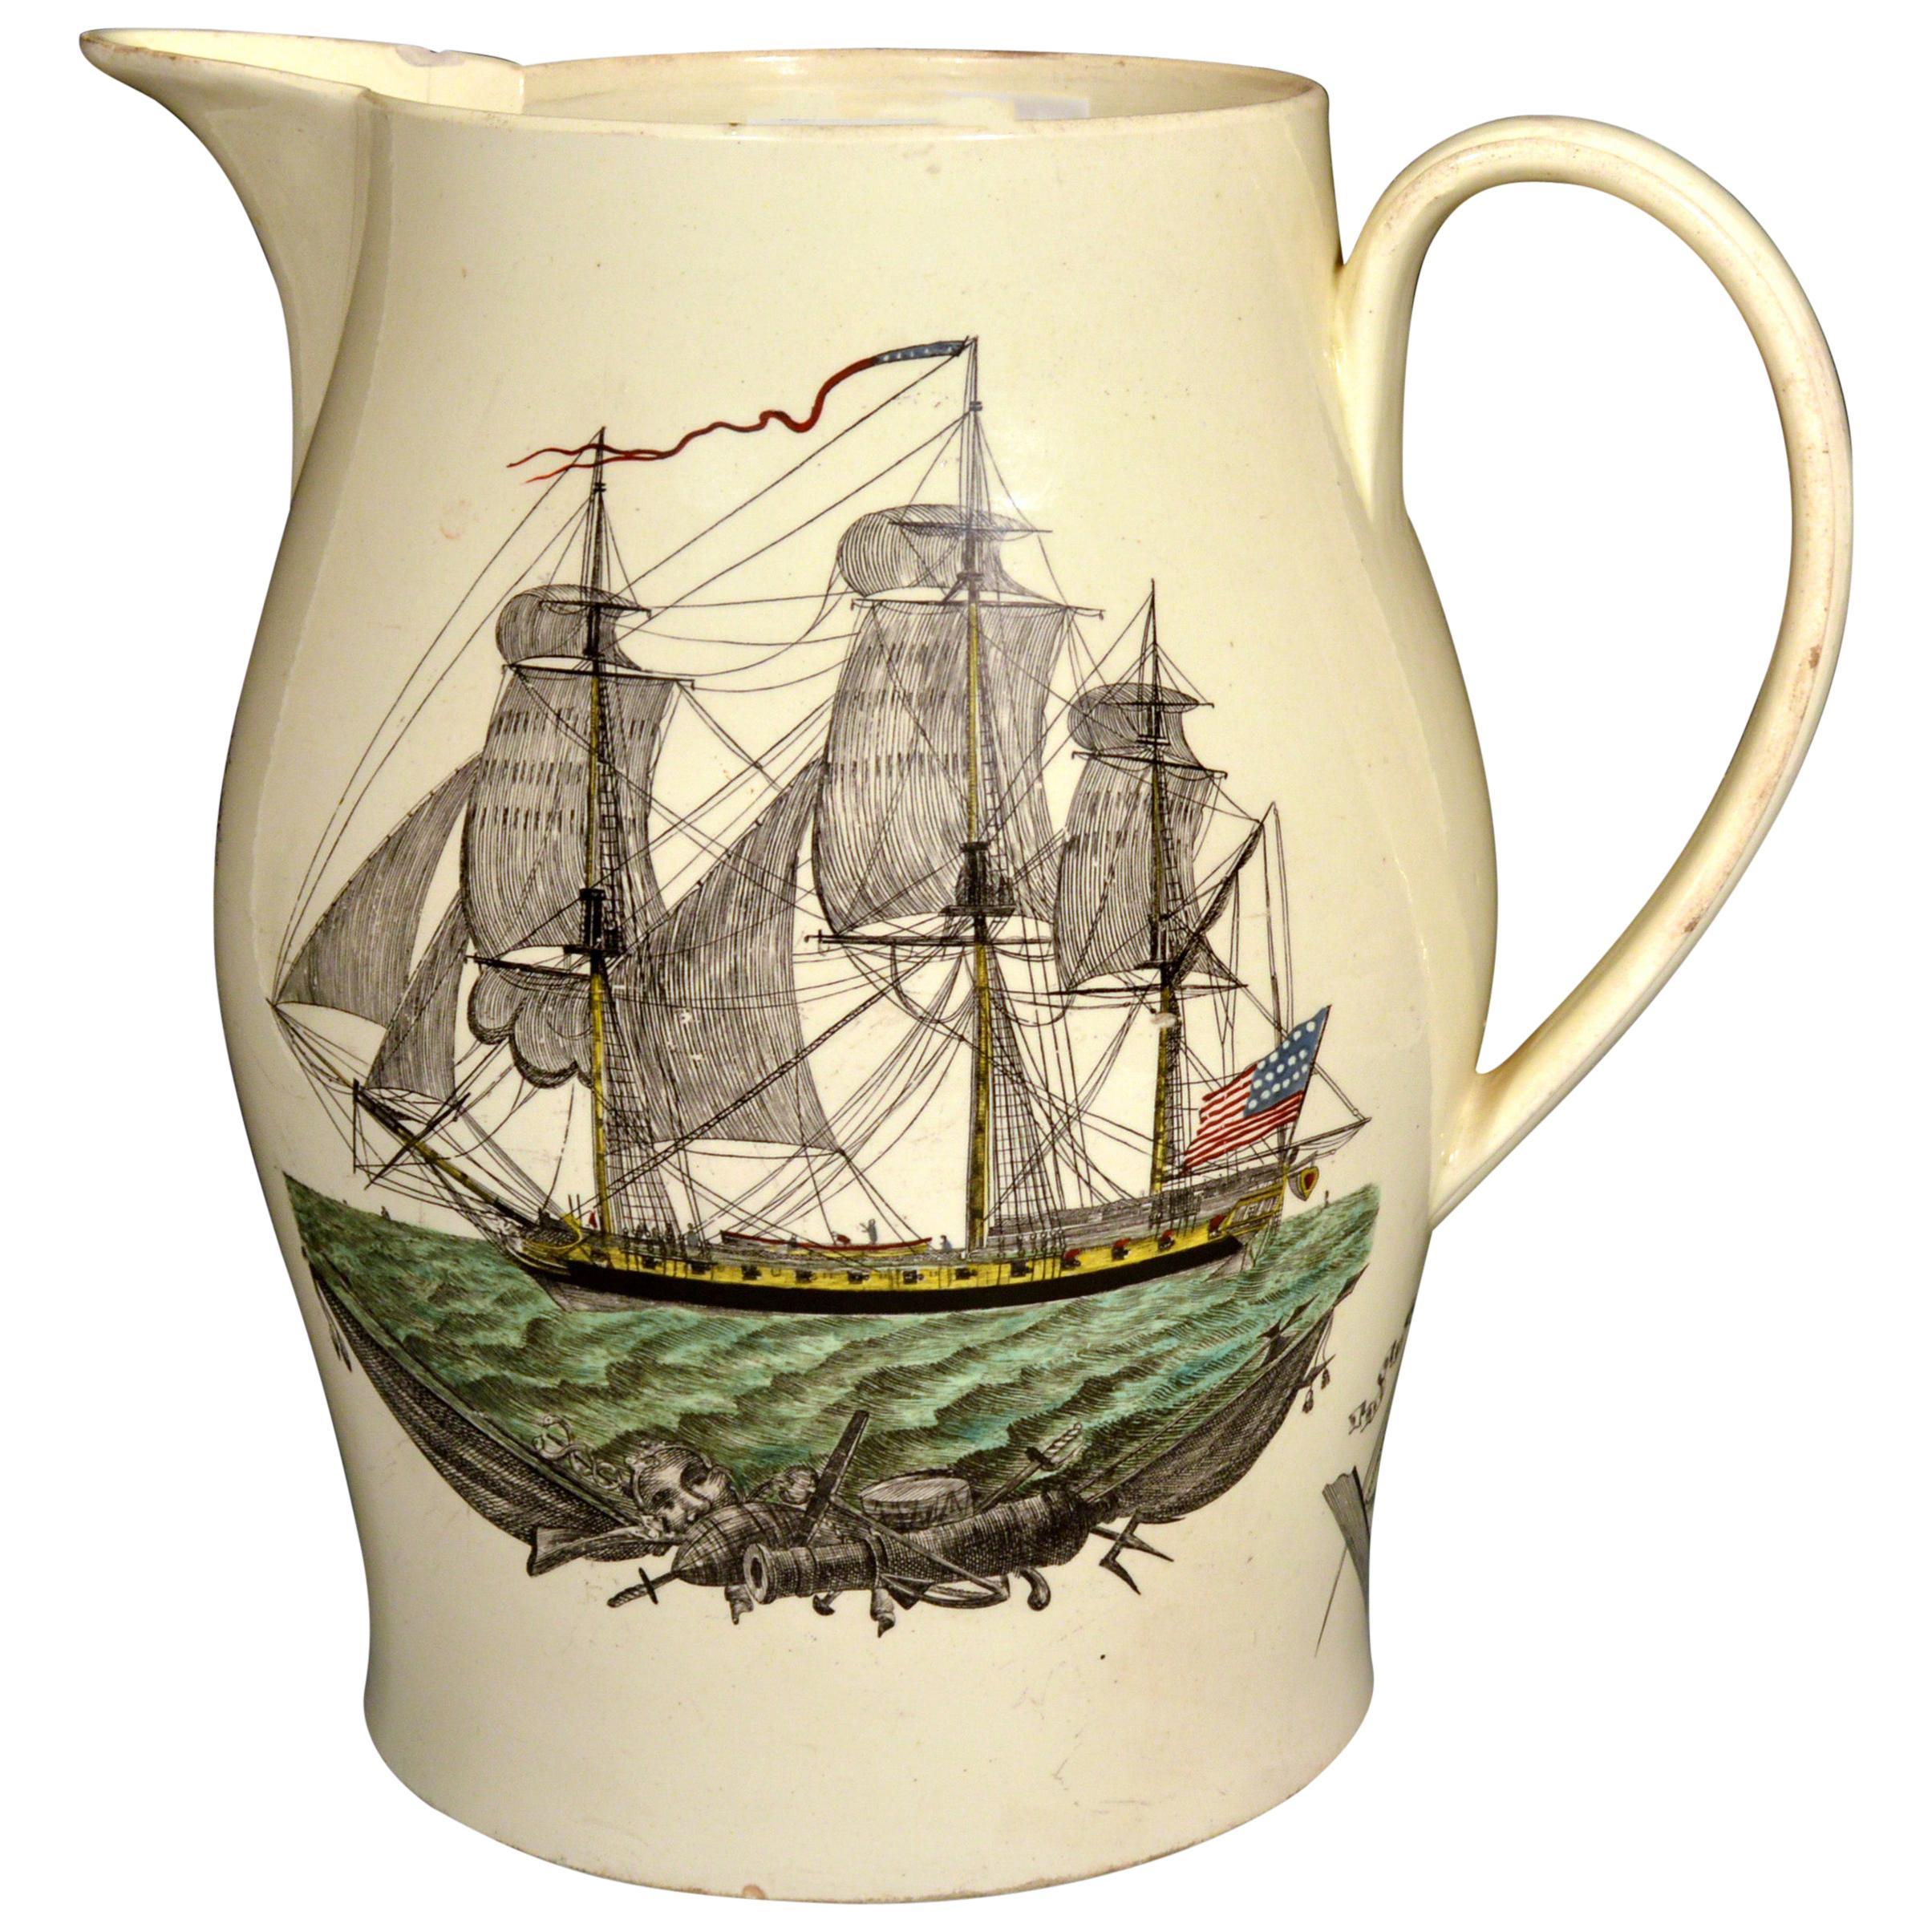 Liverpool Creamware American Ship Jug, Possibly Herculaneum Pottery, Liverpool